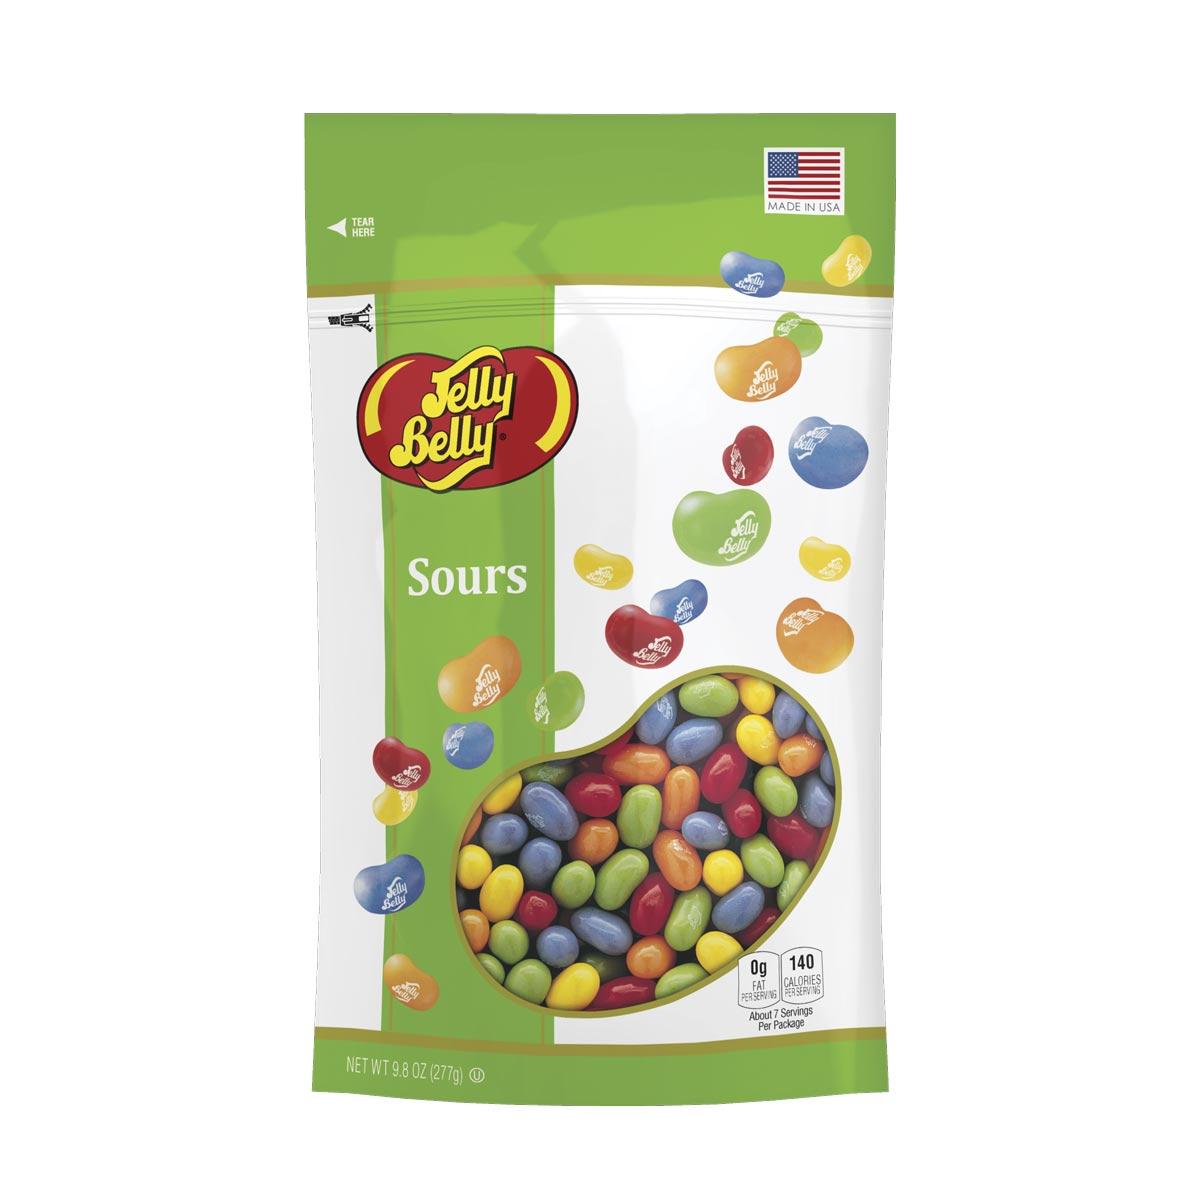 Sours Jelly Beans 98 oz Pouch Bag